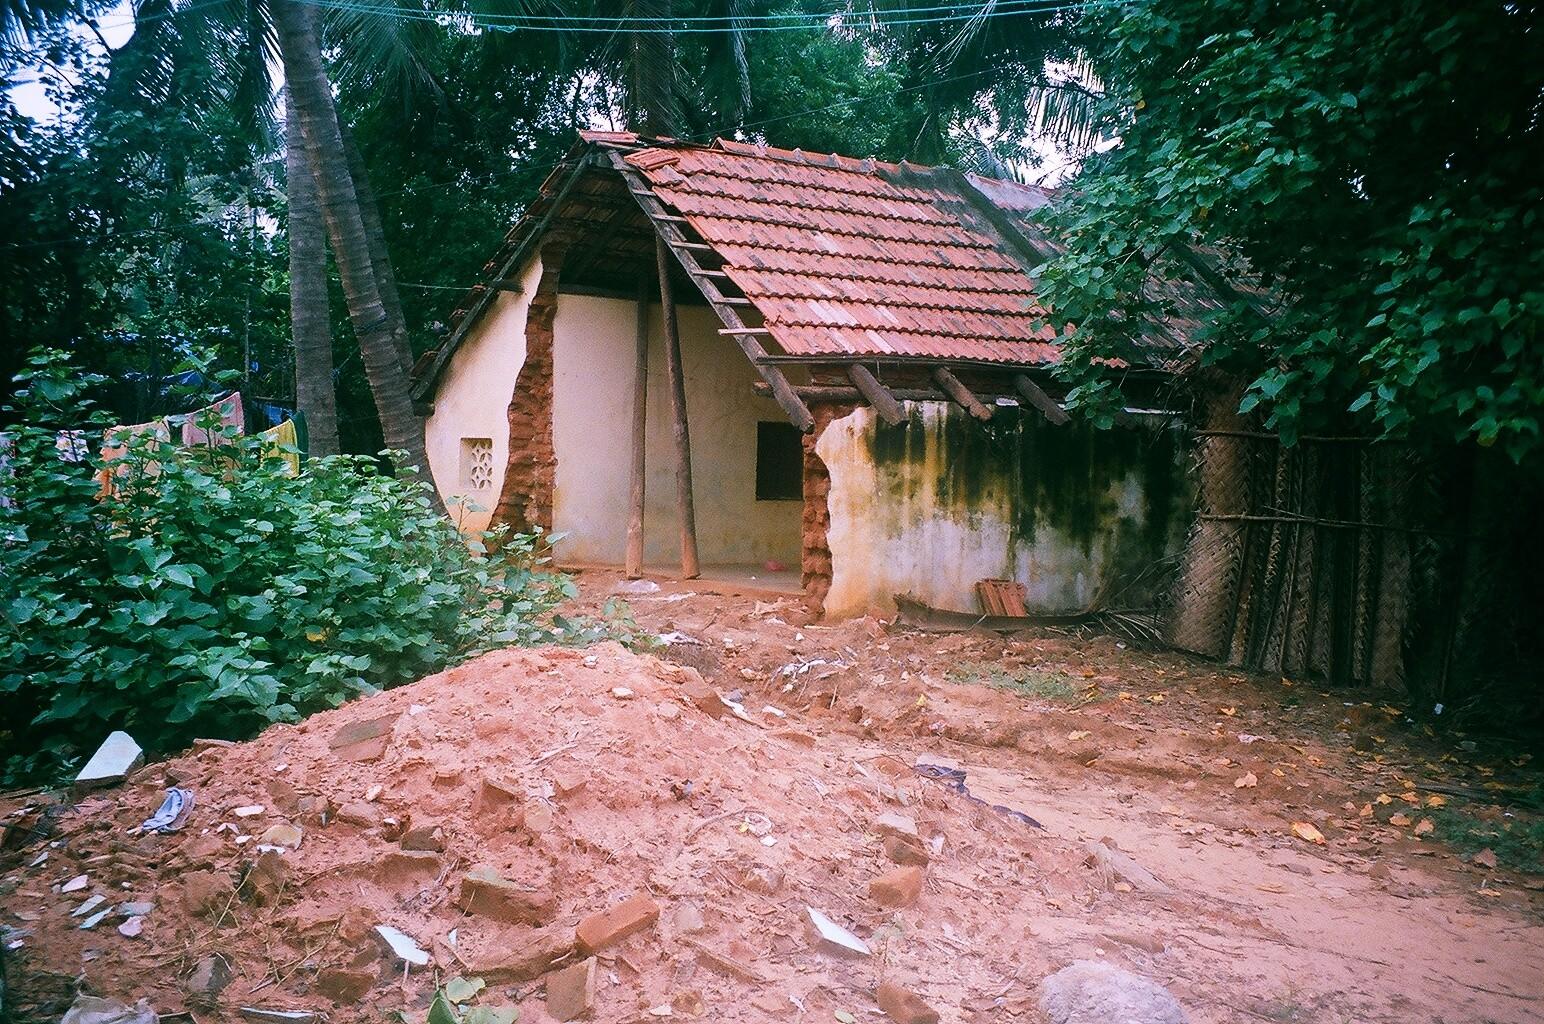 Décembre 2005 - Les ruines de Periyakalapatu